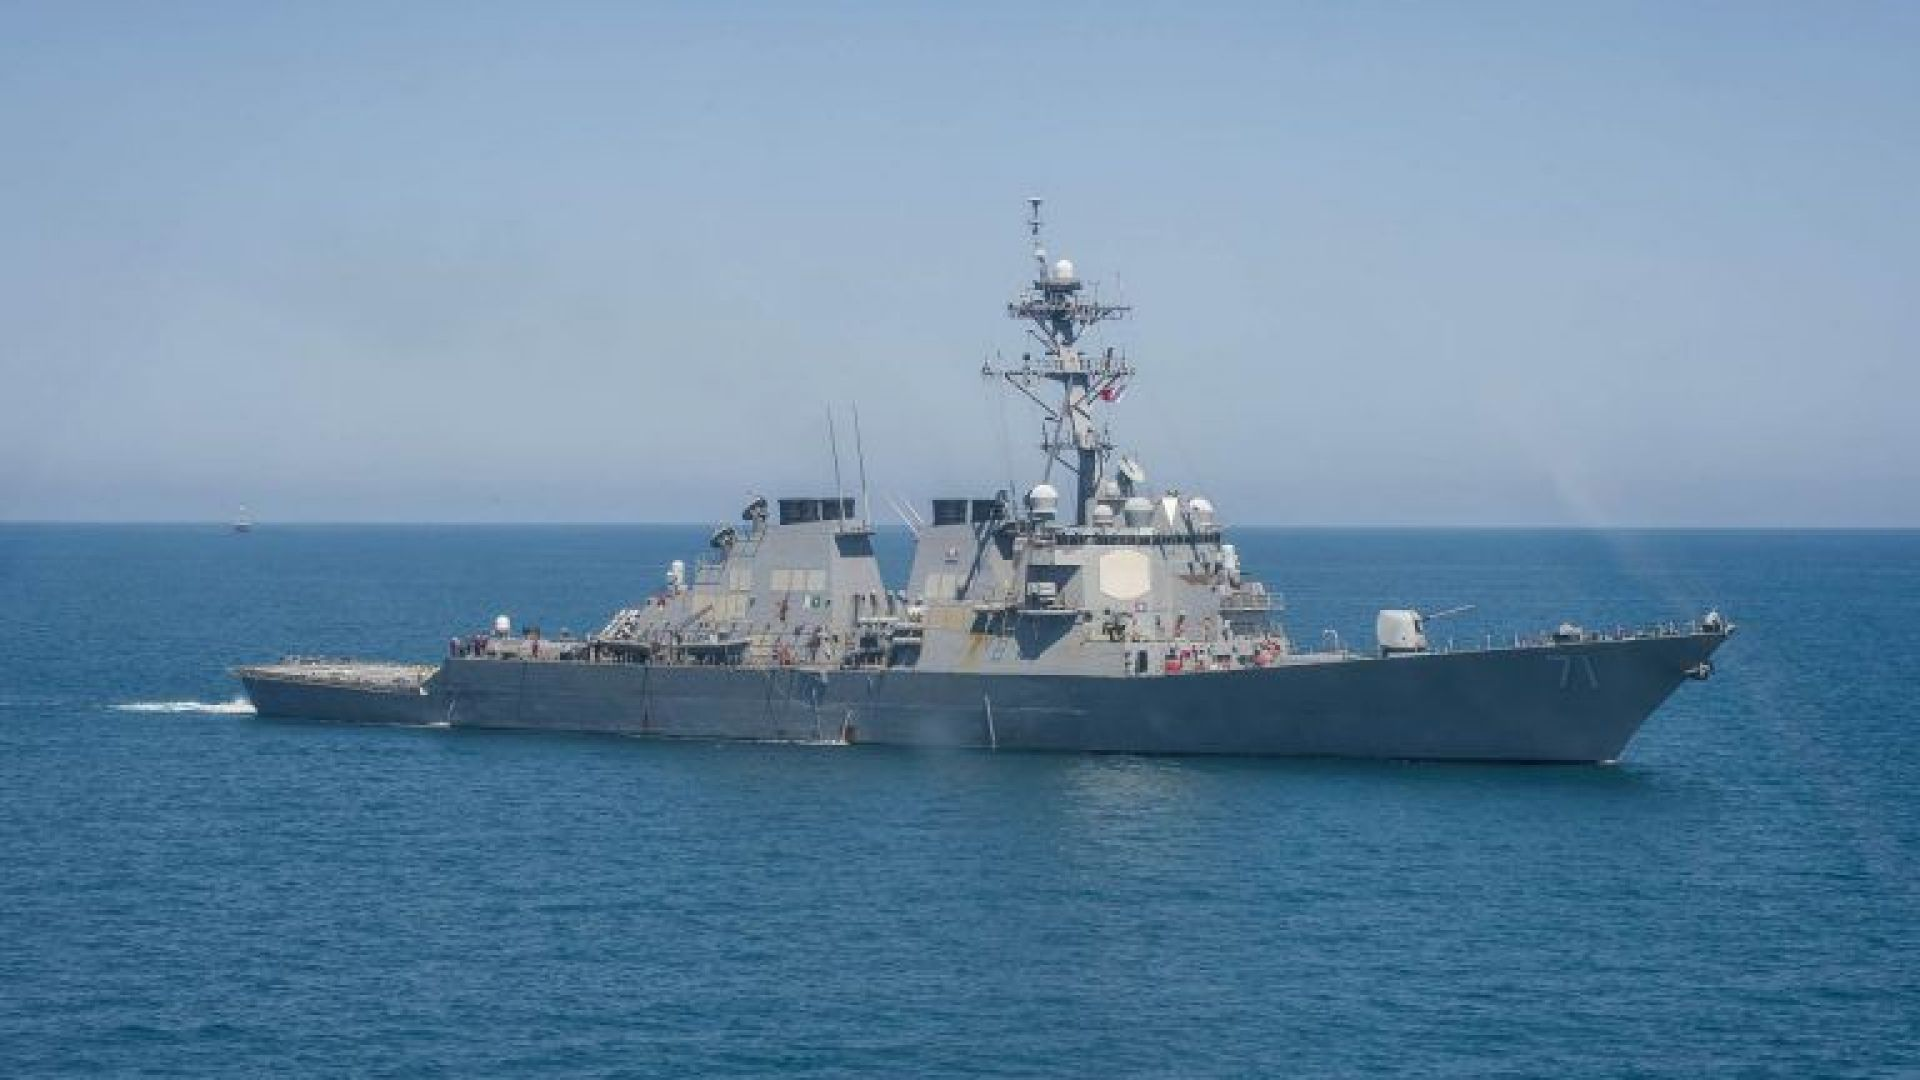 Русия контролира американски военен кораб в Черно море